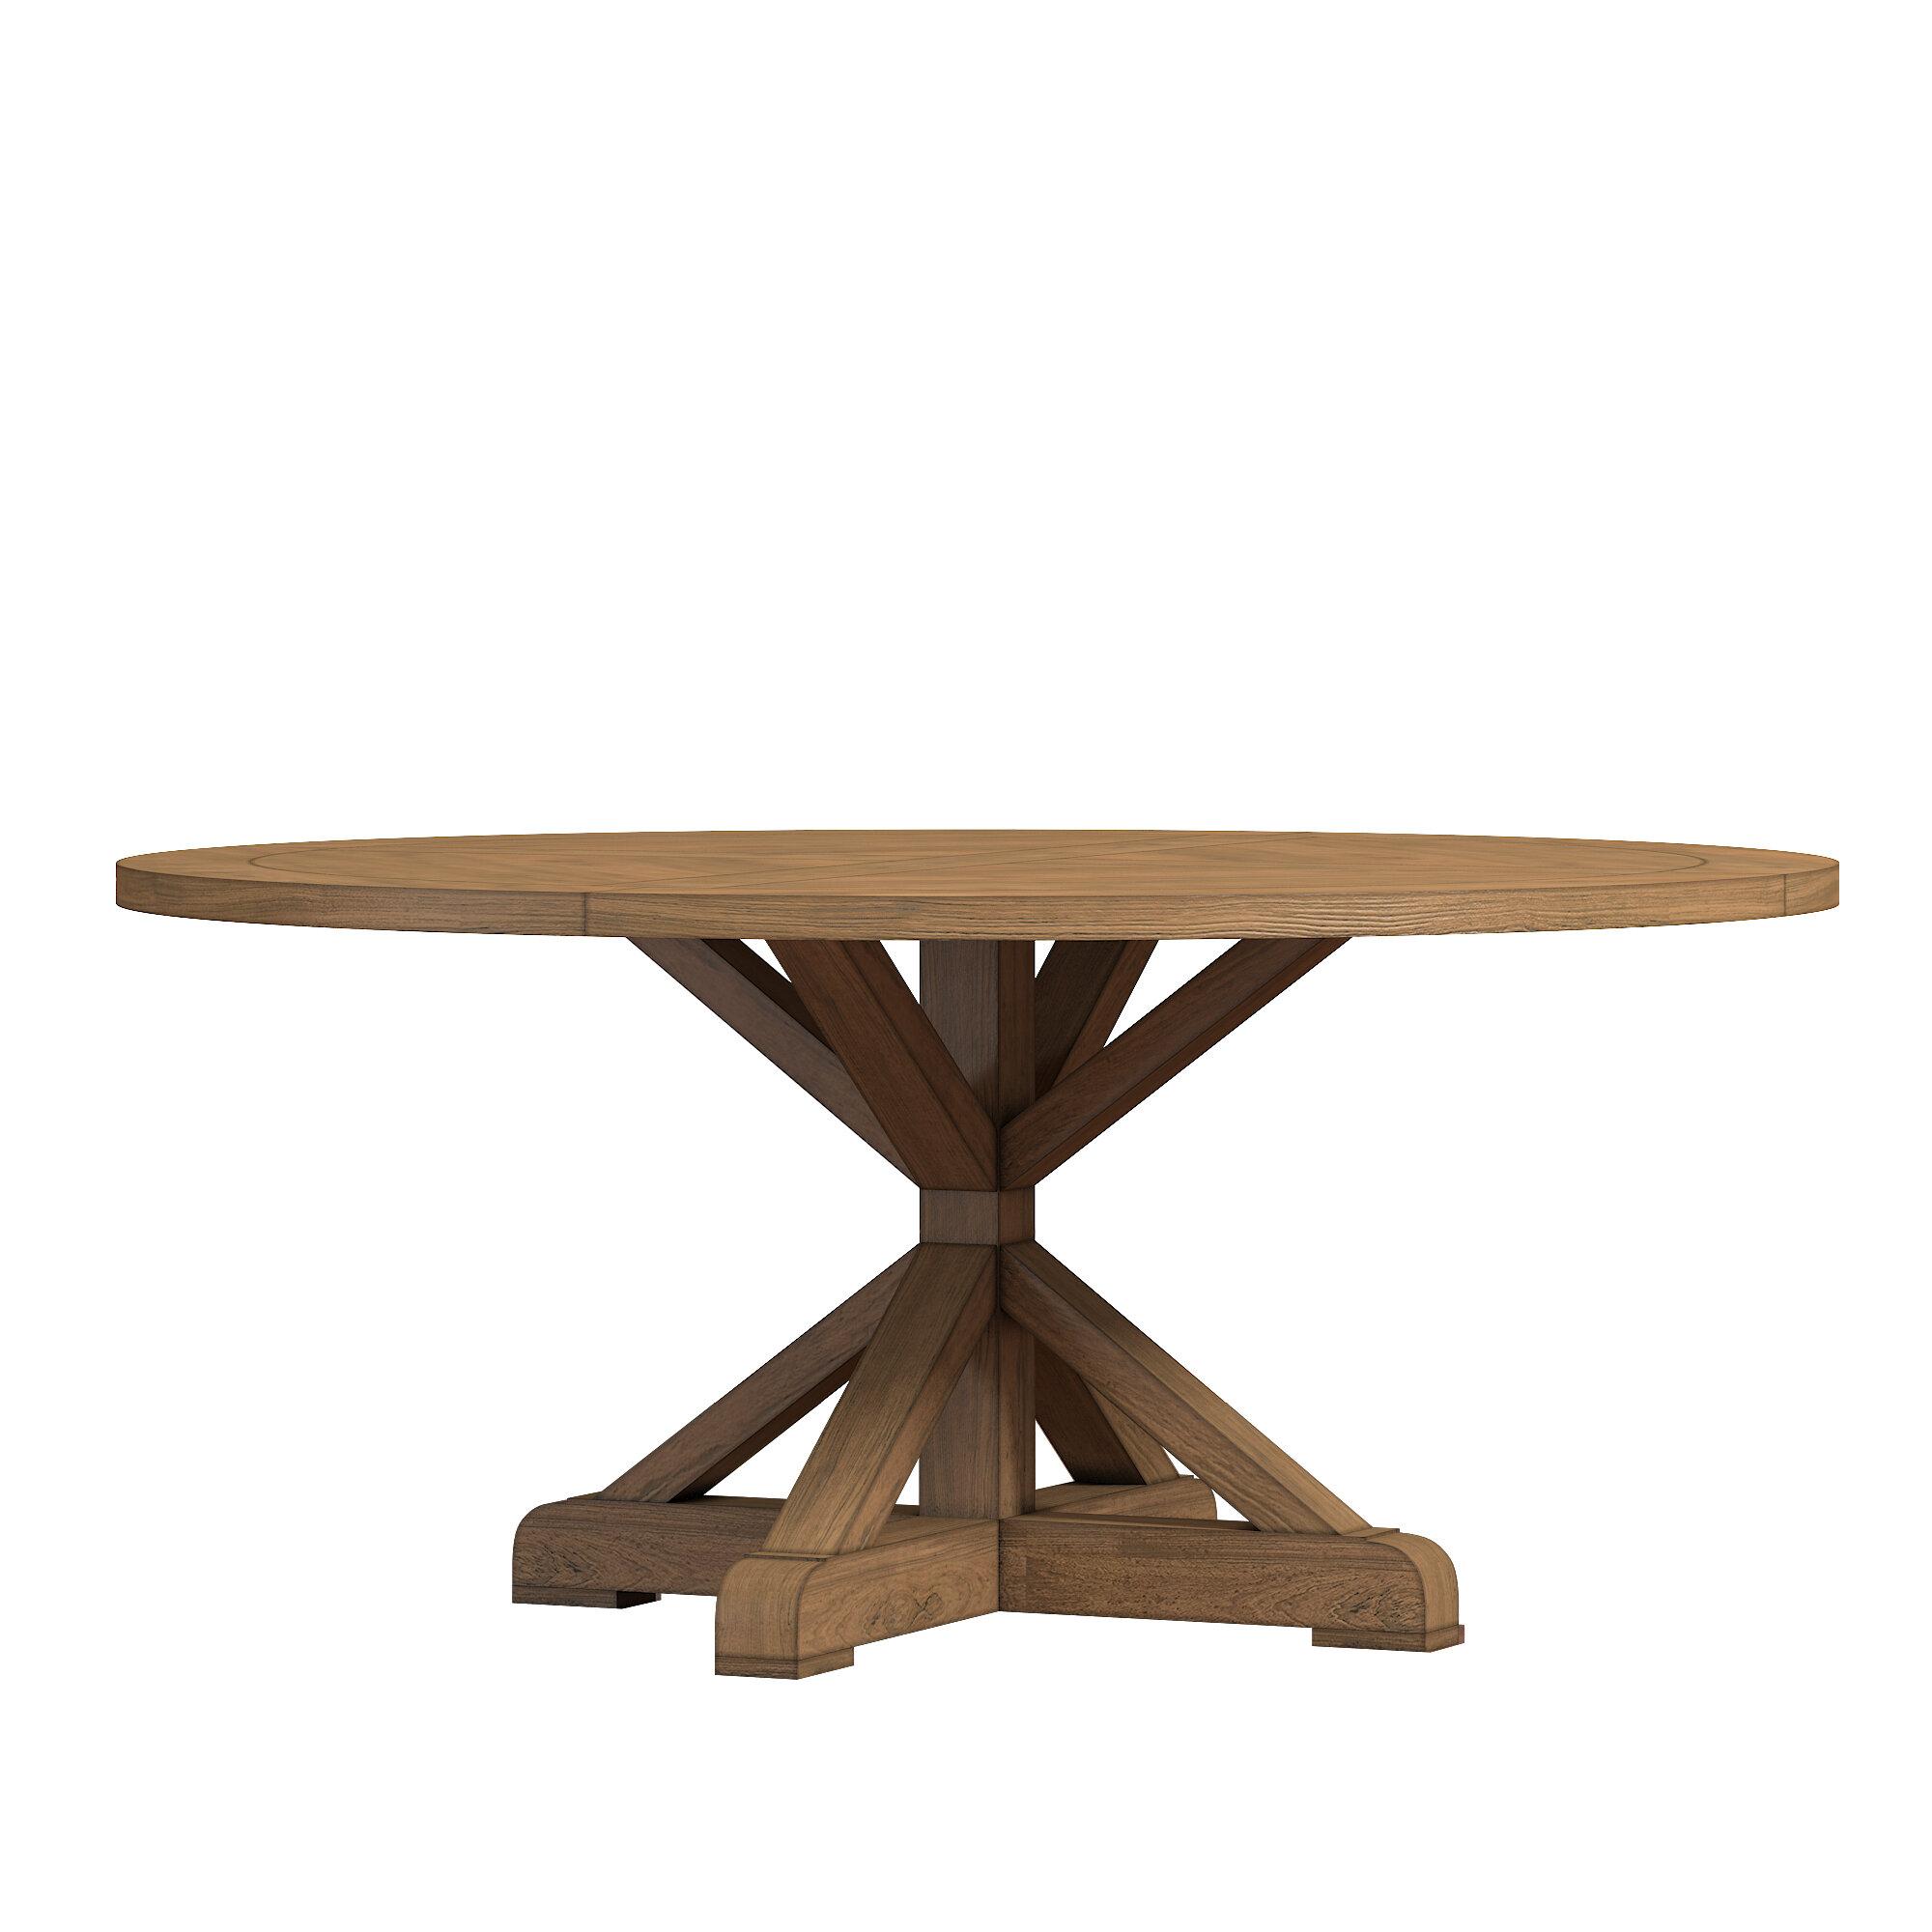 Lark Manor Peralta Round Rustic Solid Wood Dining Table Reviews Wayfair